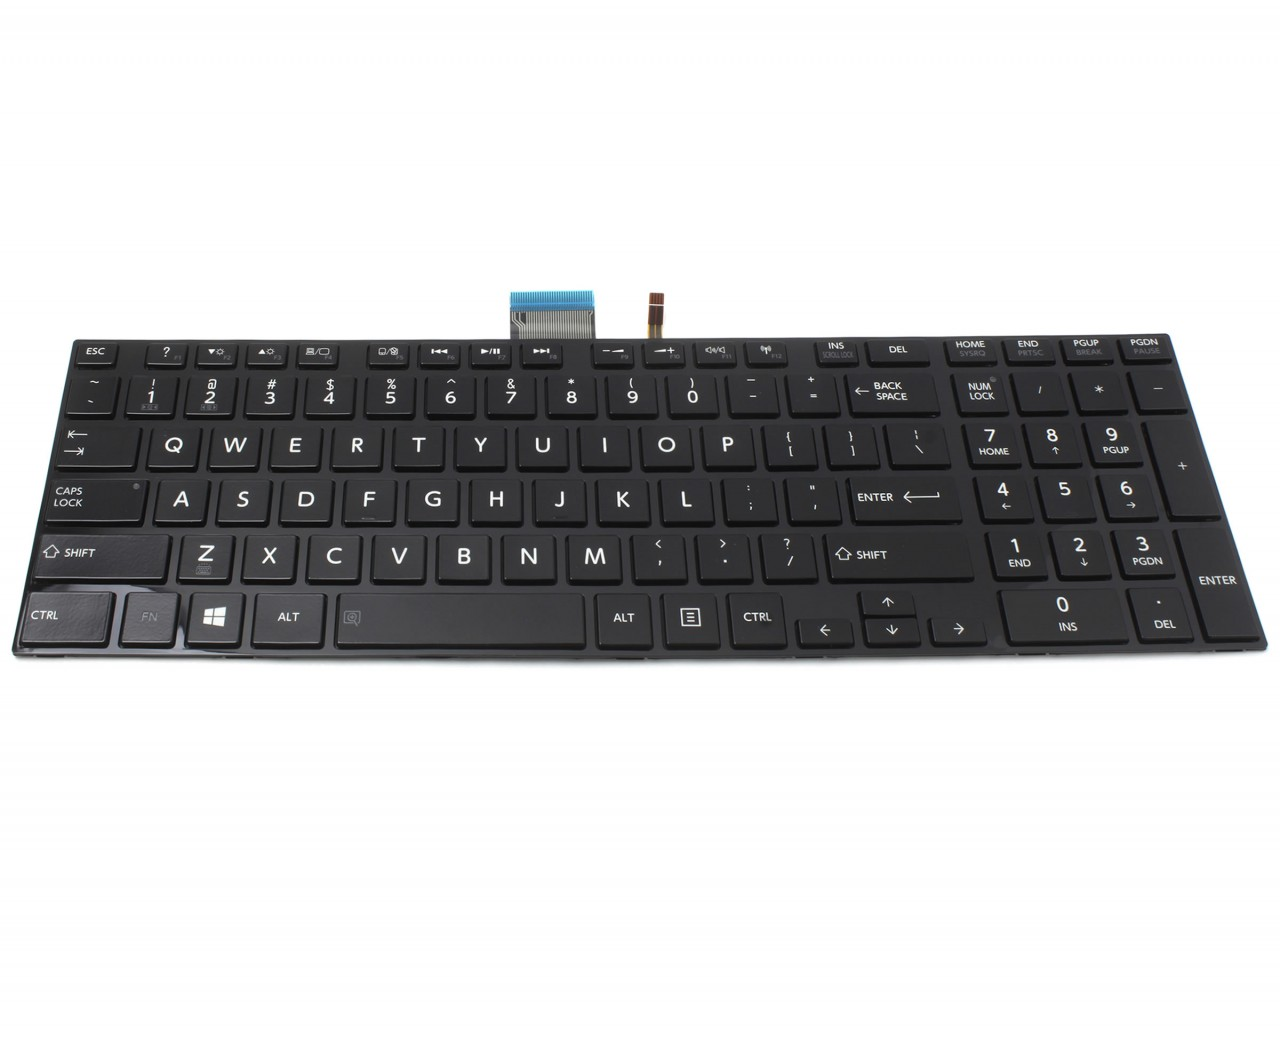 Tastatura Toshiba Satellite S70 B 10Z iluminata backlit imagine powerlaptop.ro 2021